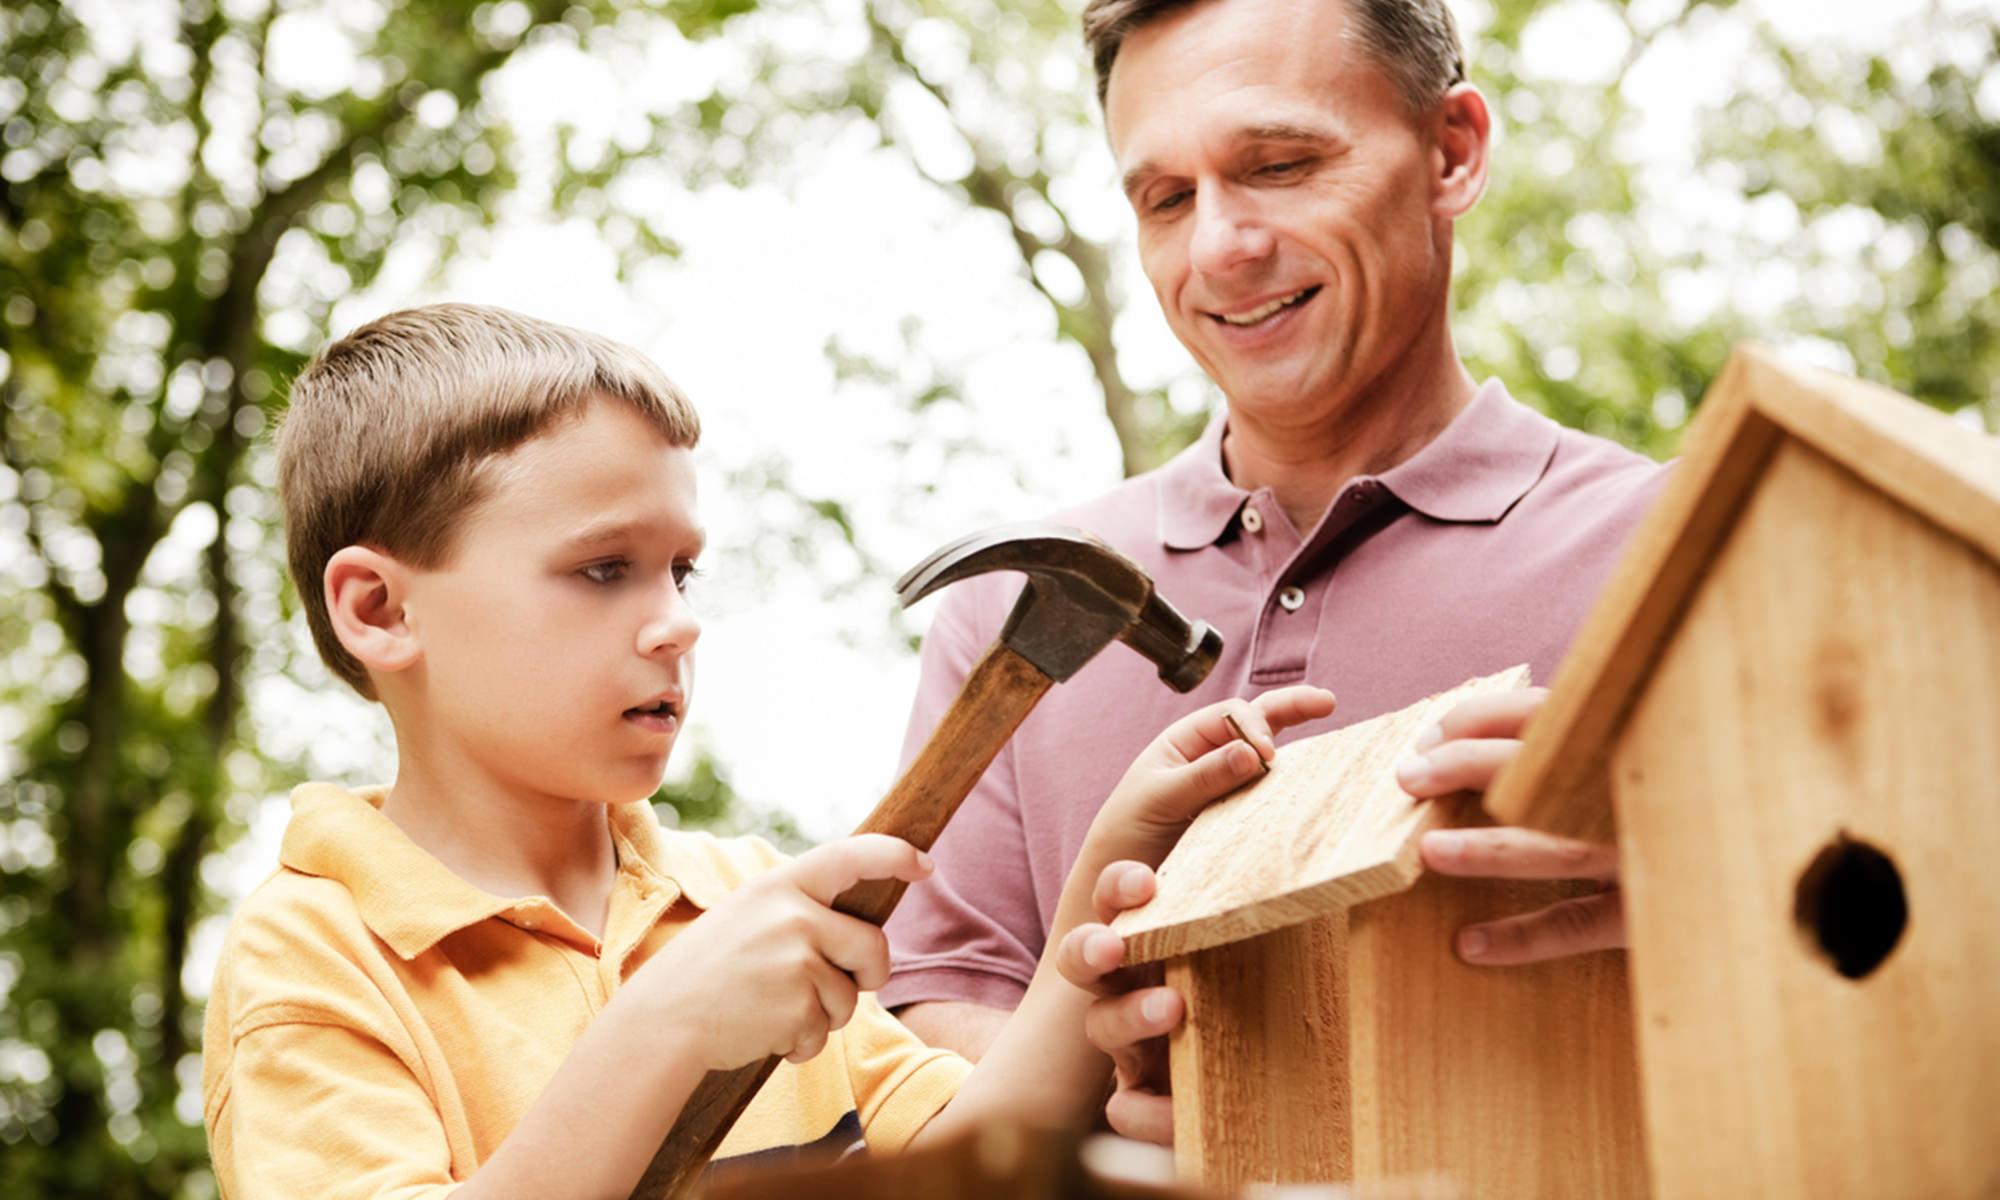 kid project birdhouse